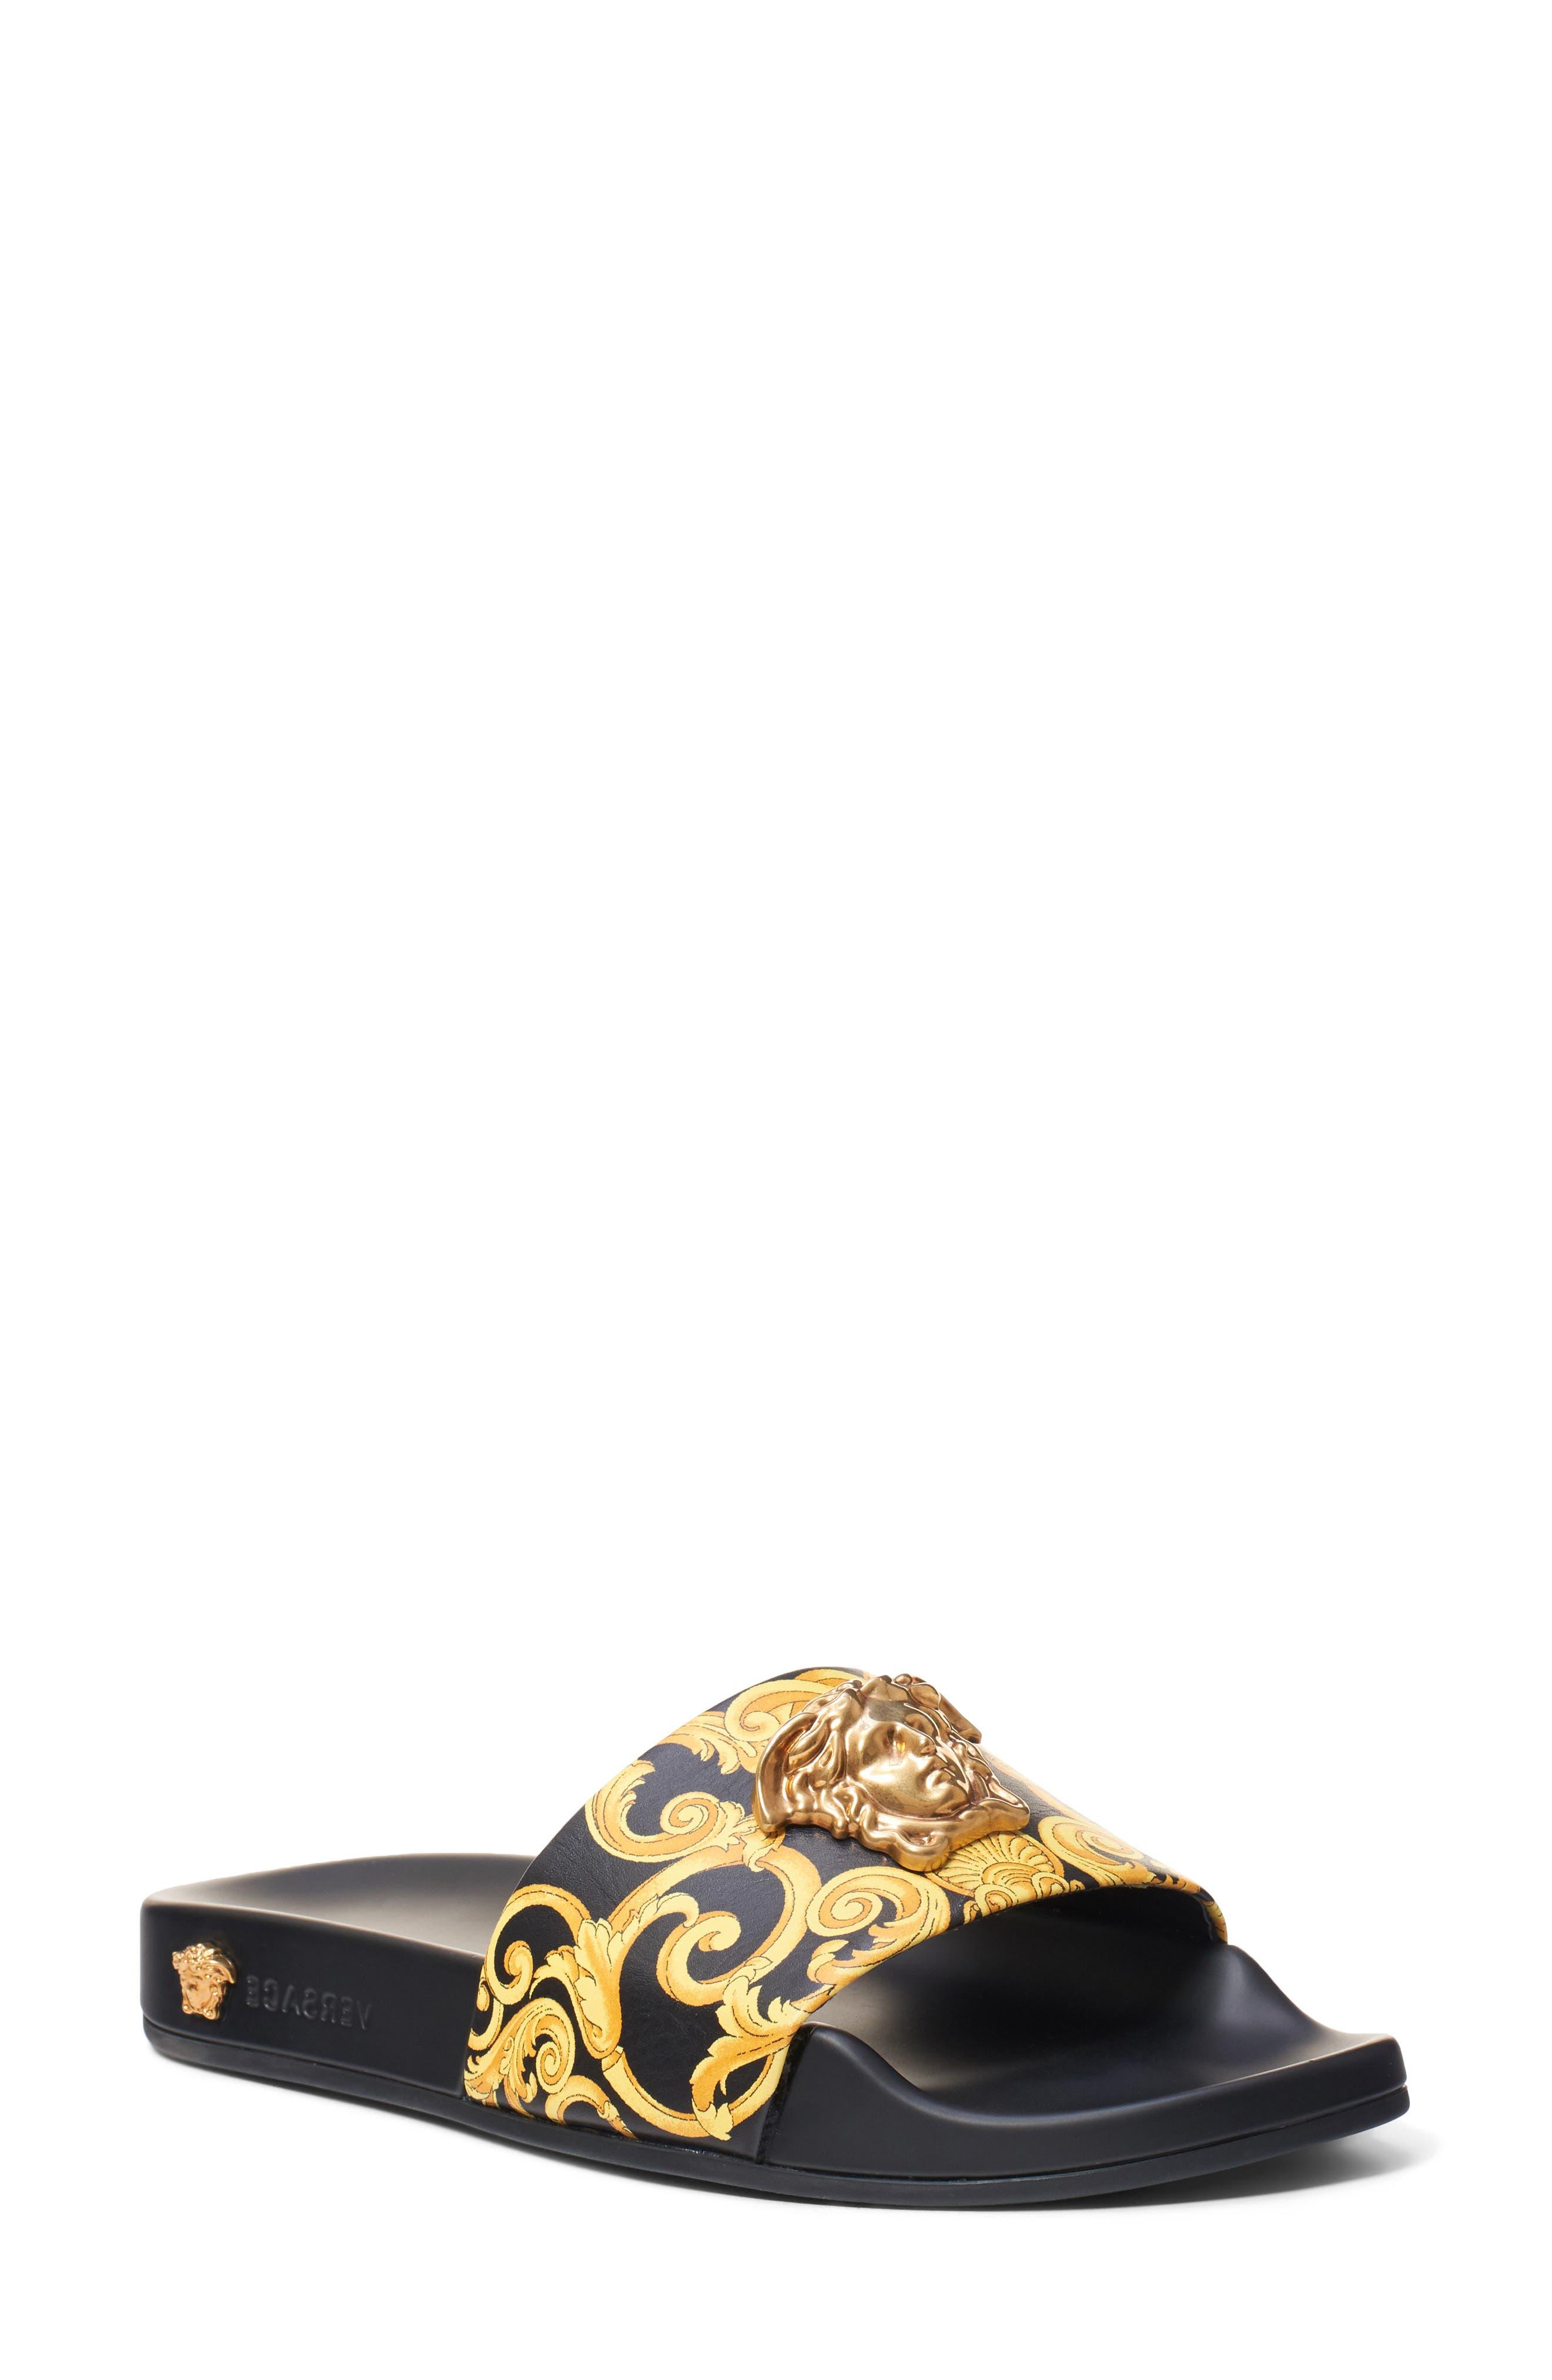 Versace First Line Medusa Hibiscus Slide Sandal, Black